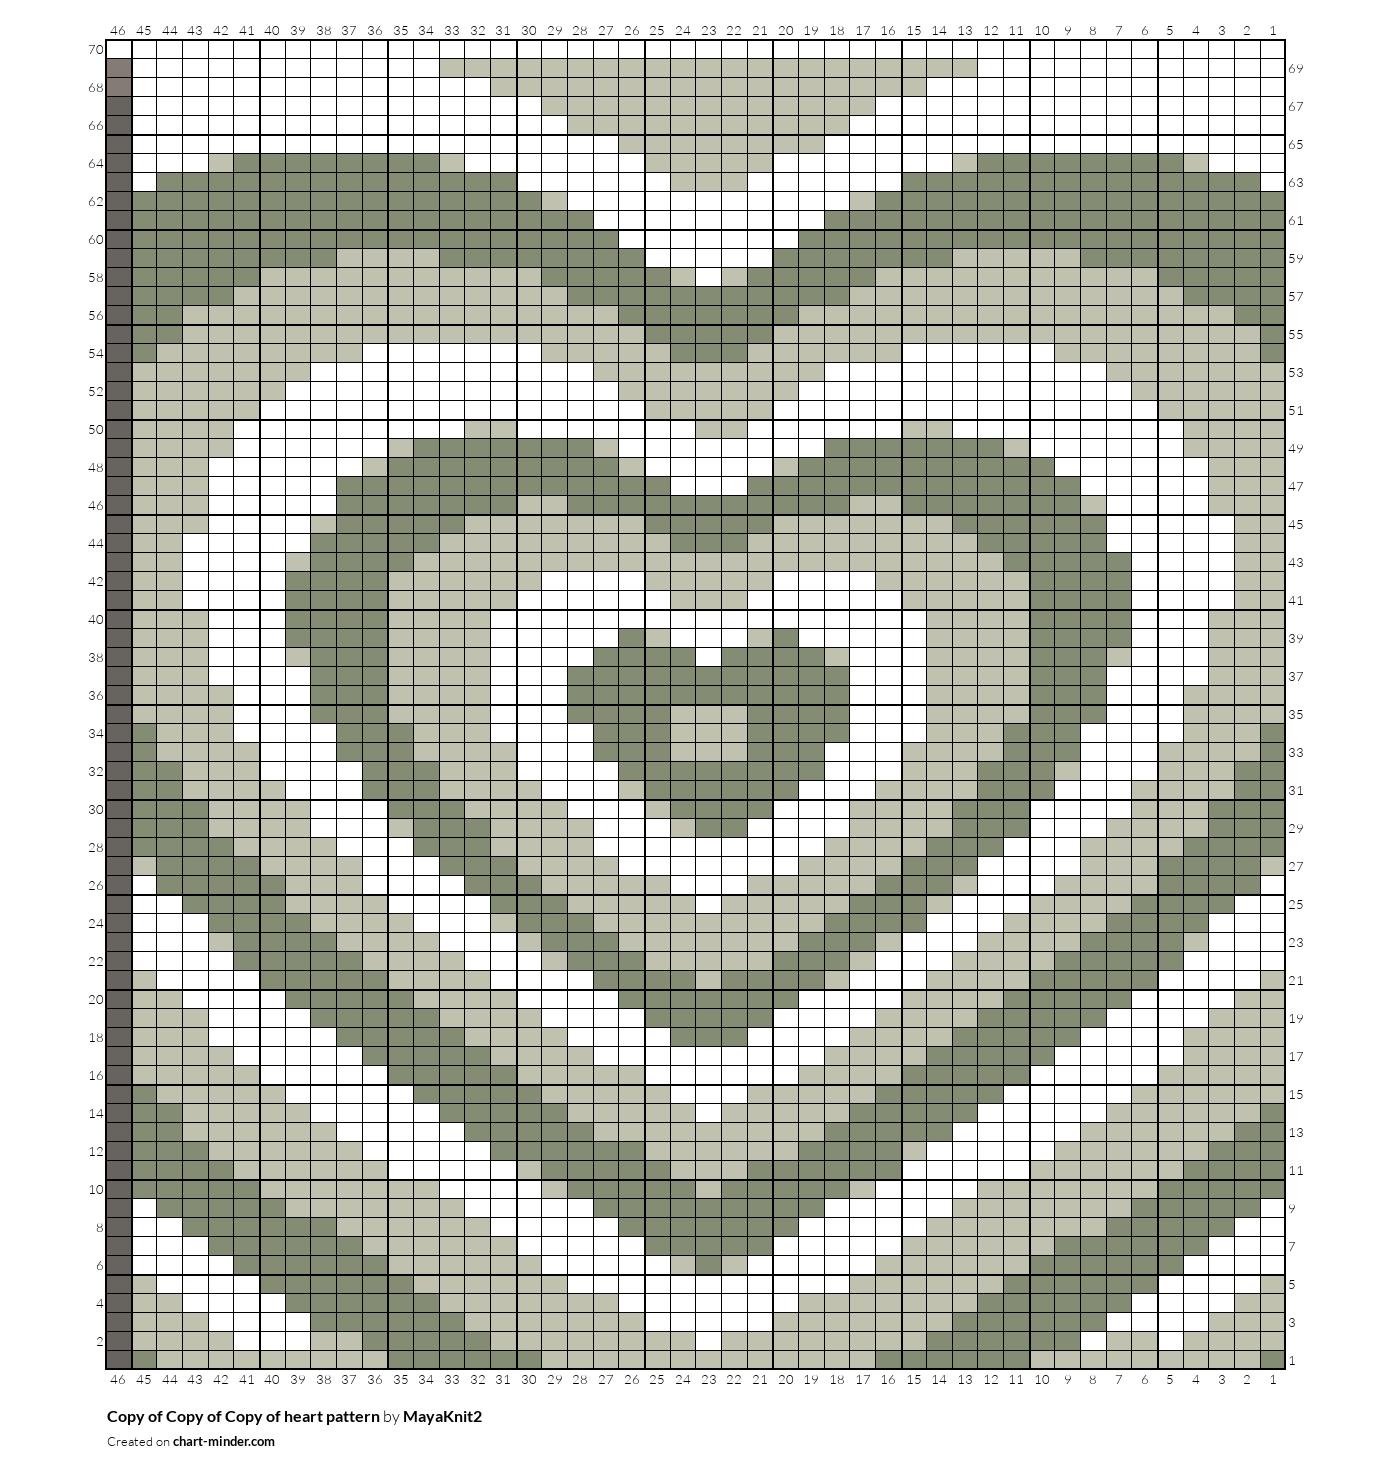 Copy of Copy of Copy of heart pattern